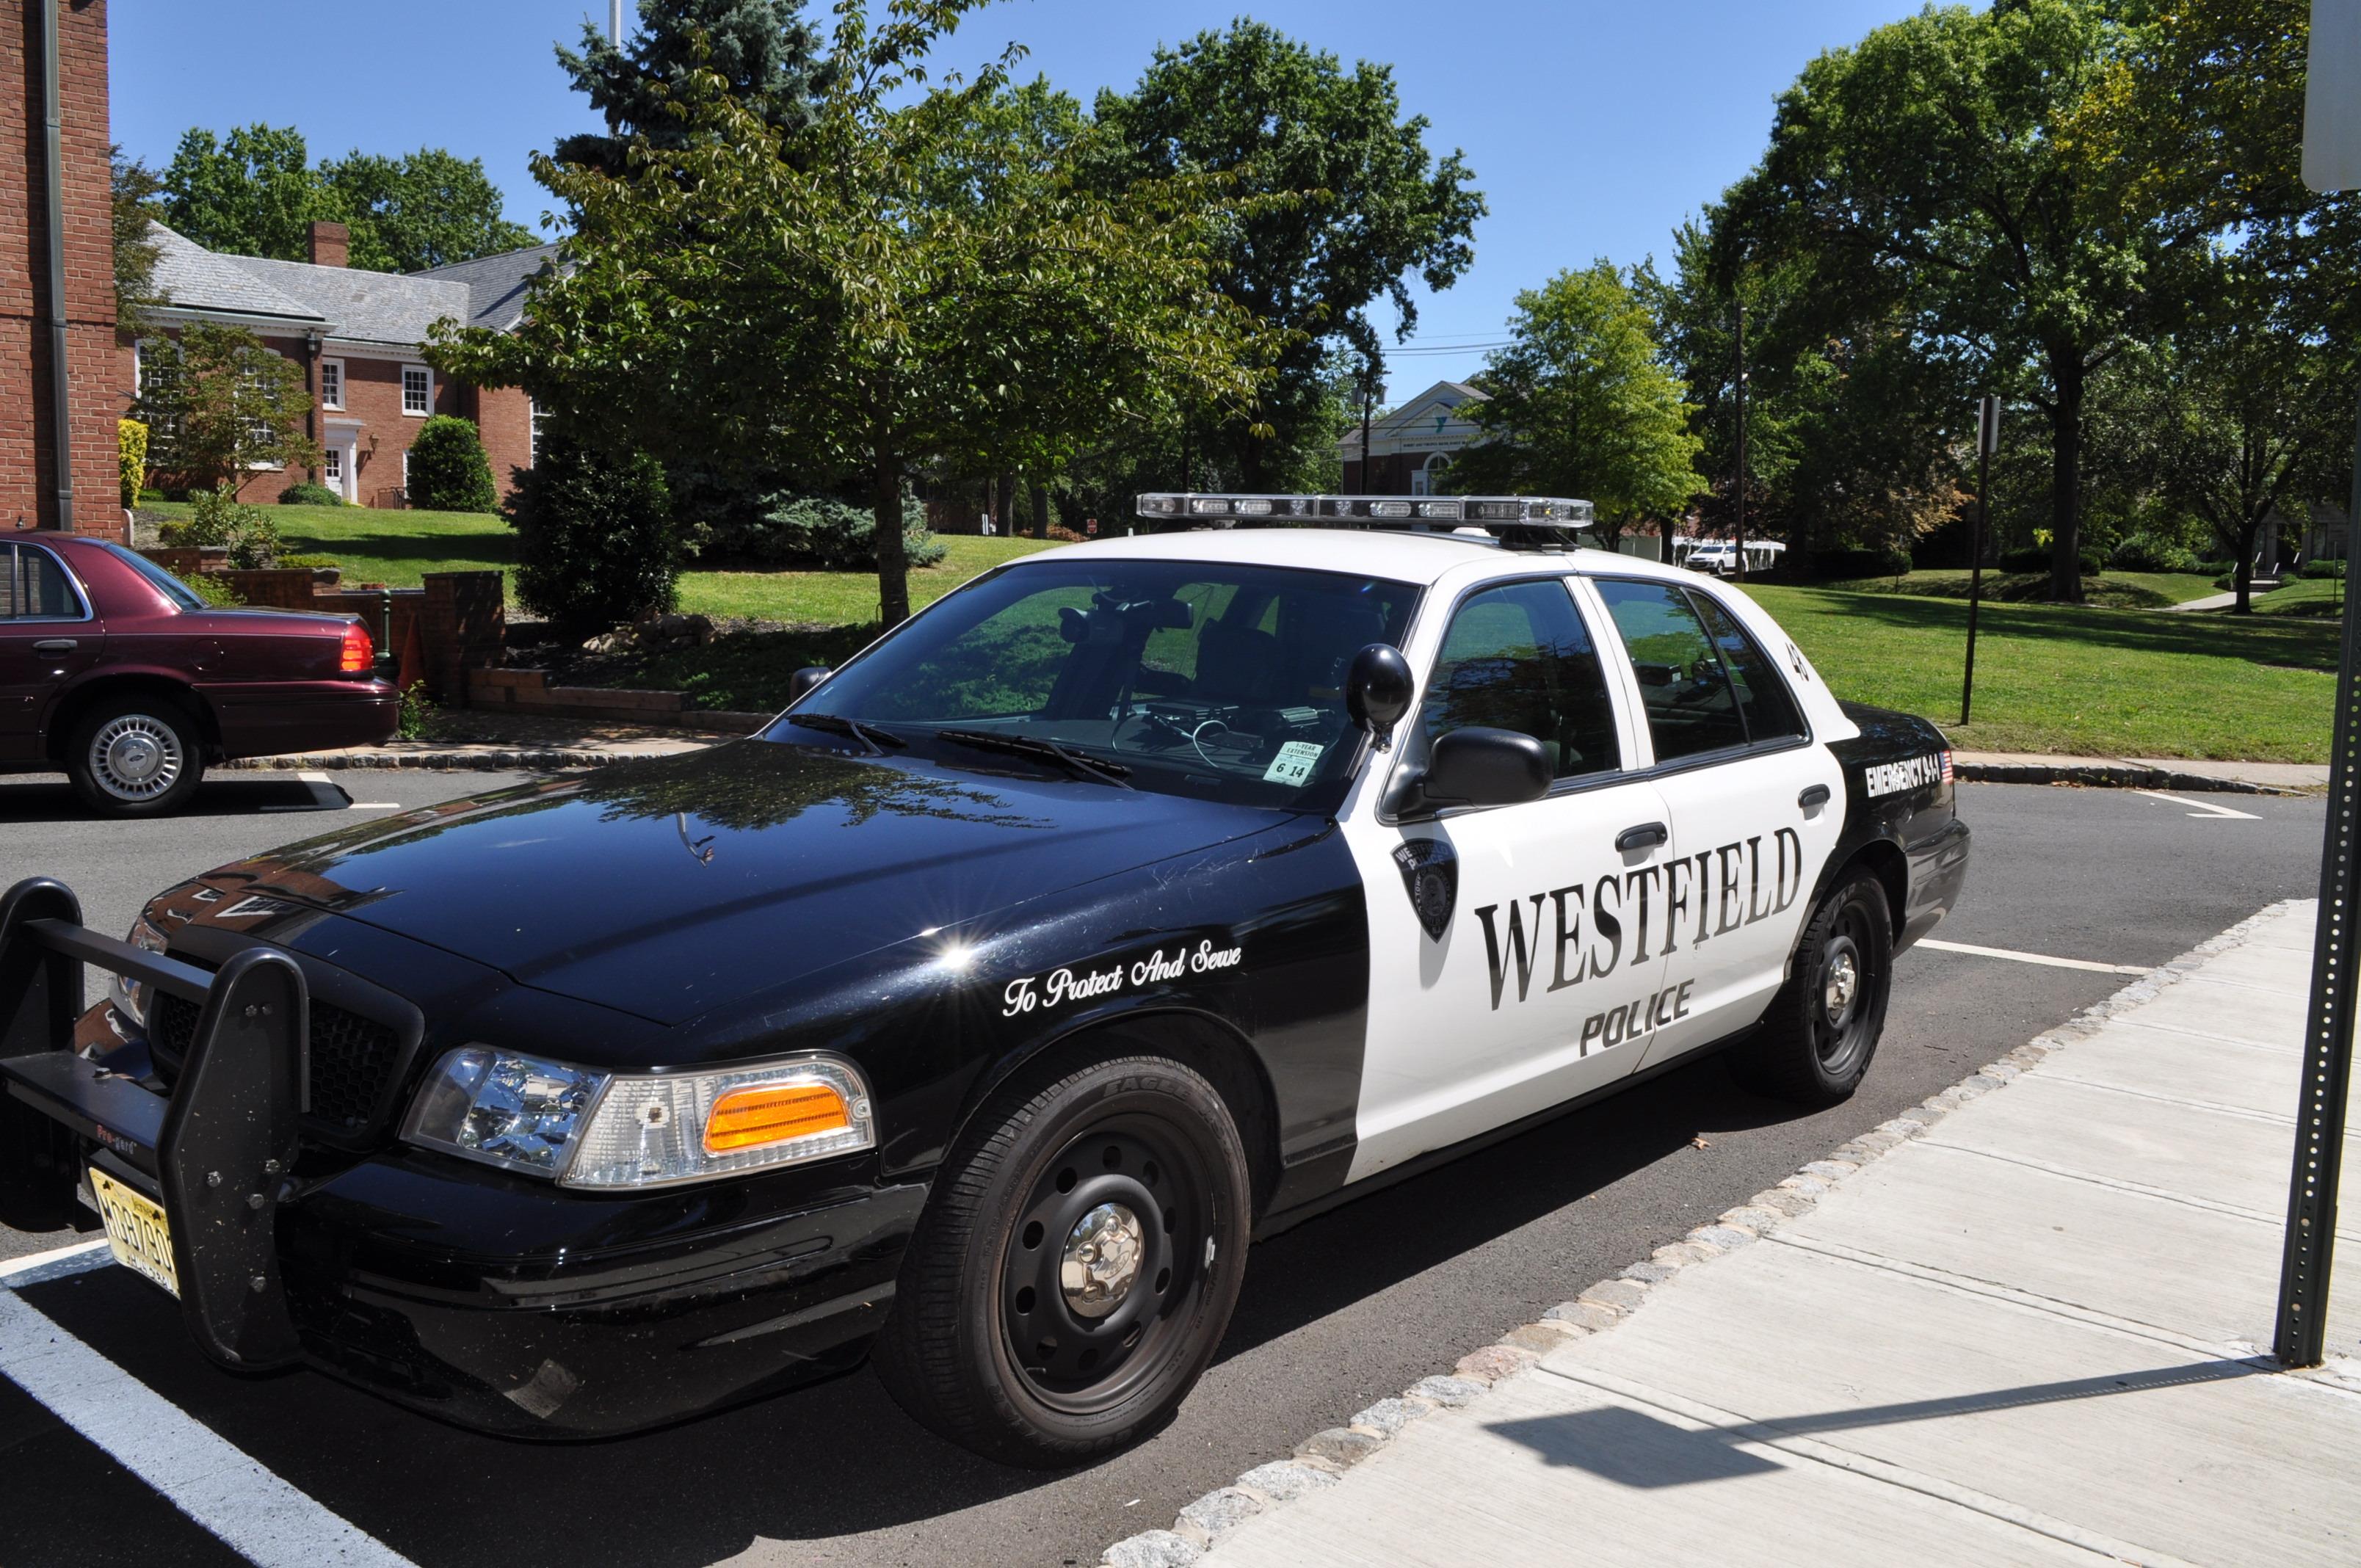 18e338831a27b796b6a5_police_car.JPG